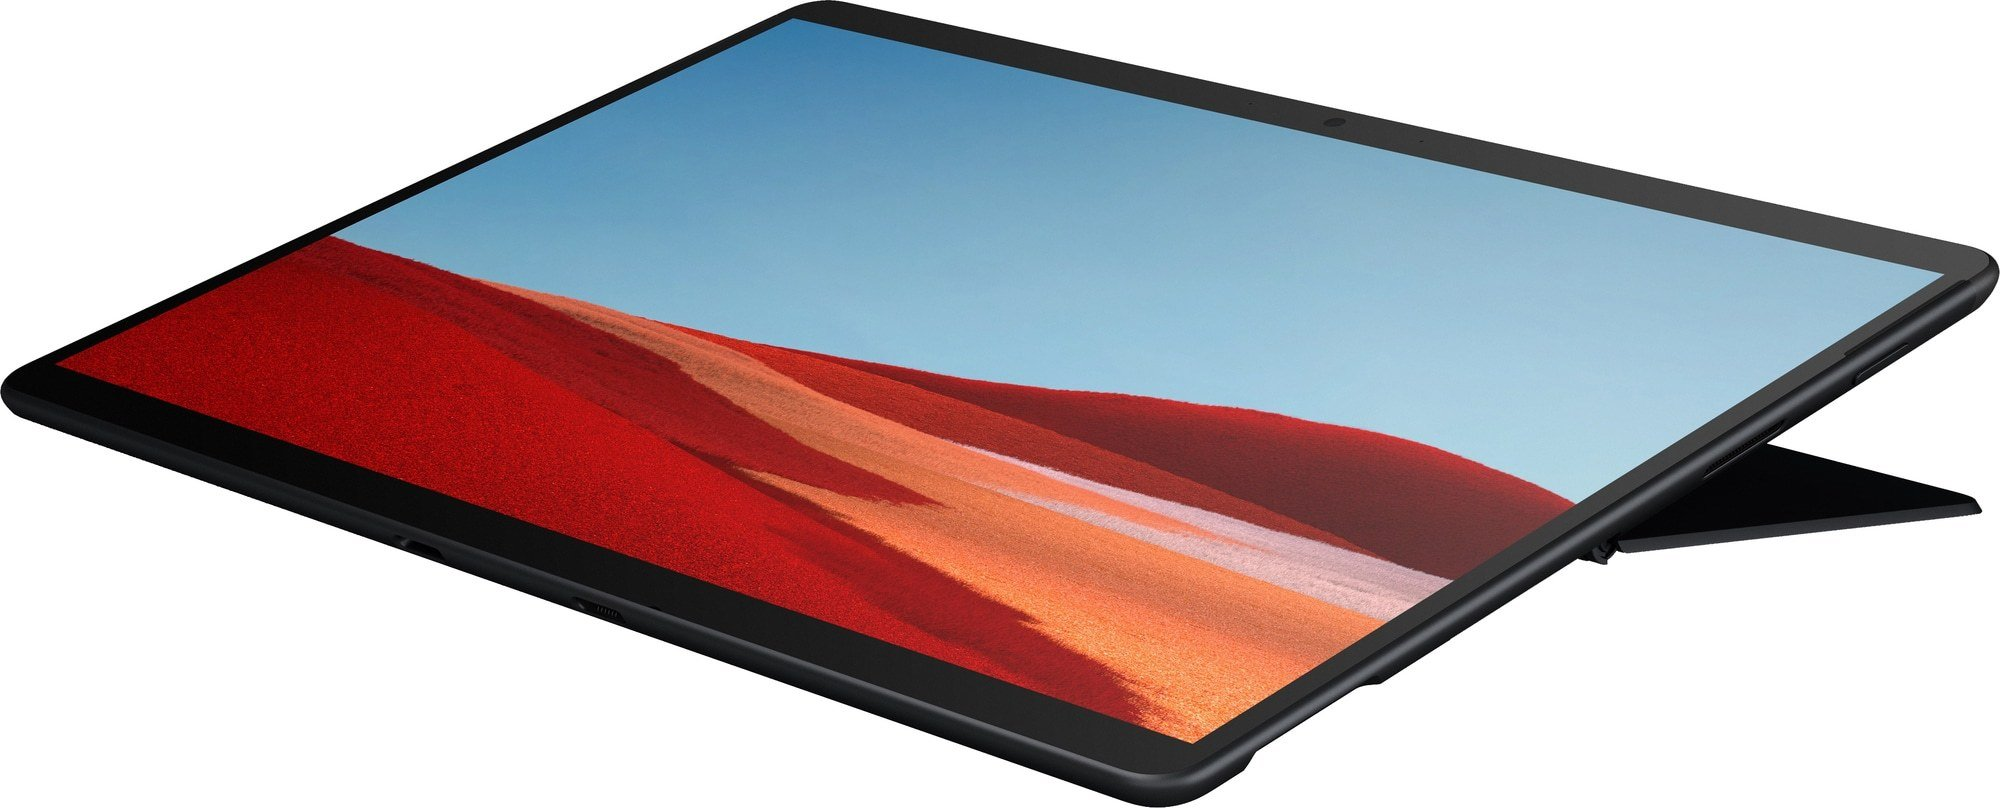 Surface Pro X 8128 GB (sort) Bærbar PC Elkjøp